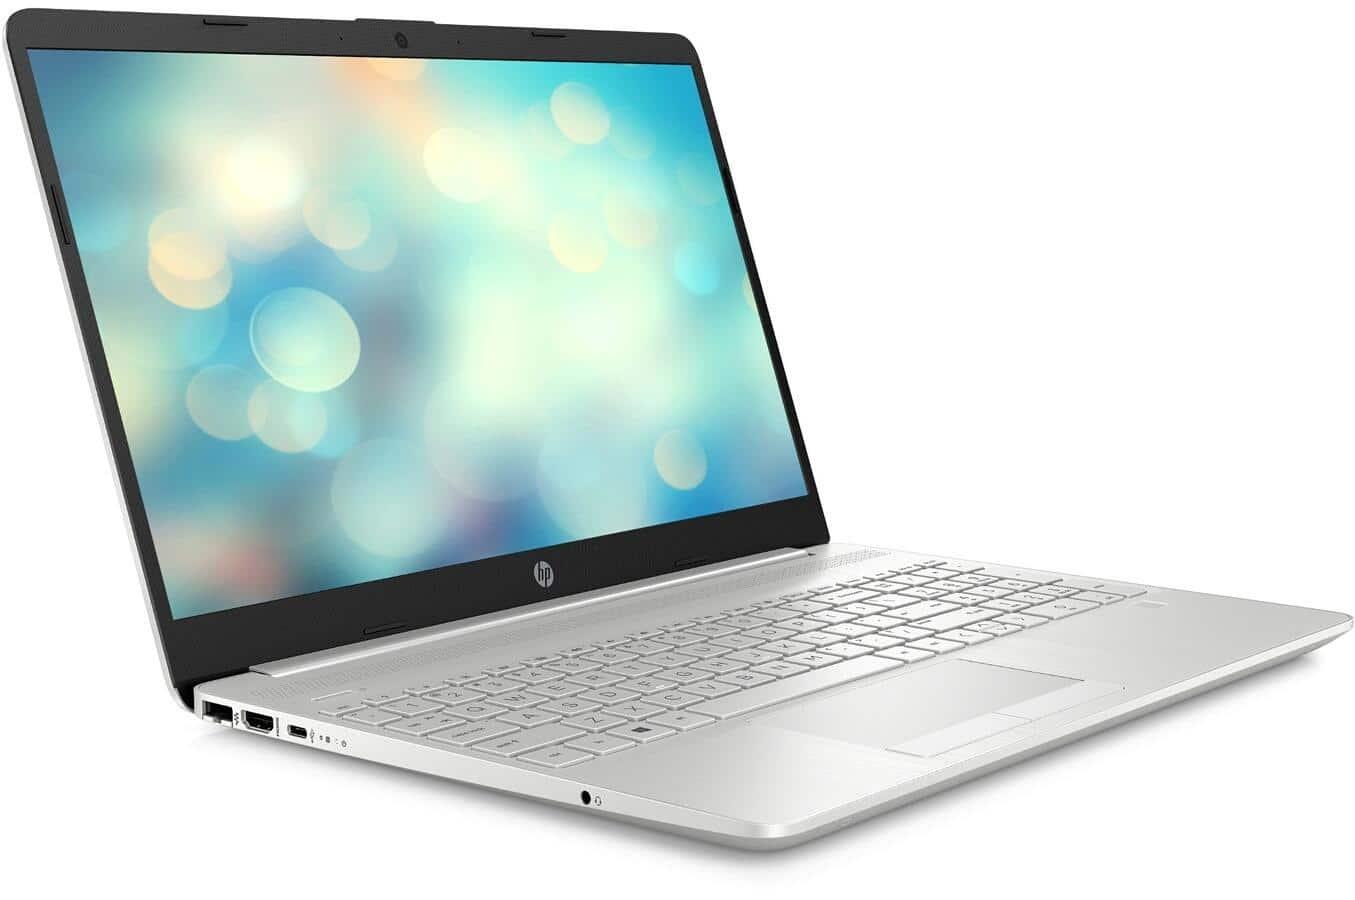 HP 15-dw0018nf, ultrabook 15 pouces léger Turbo (529€)